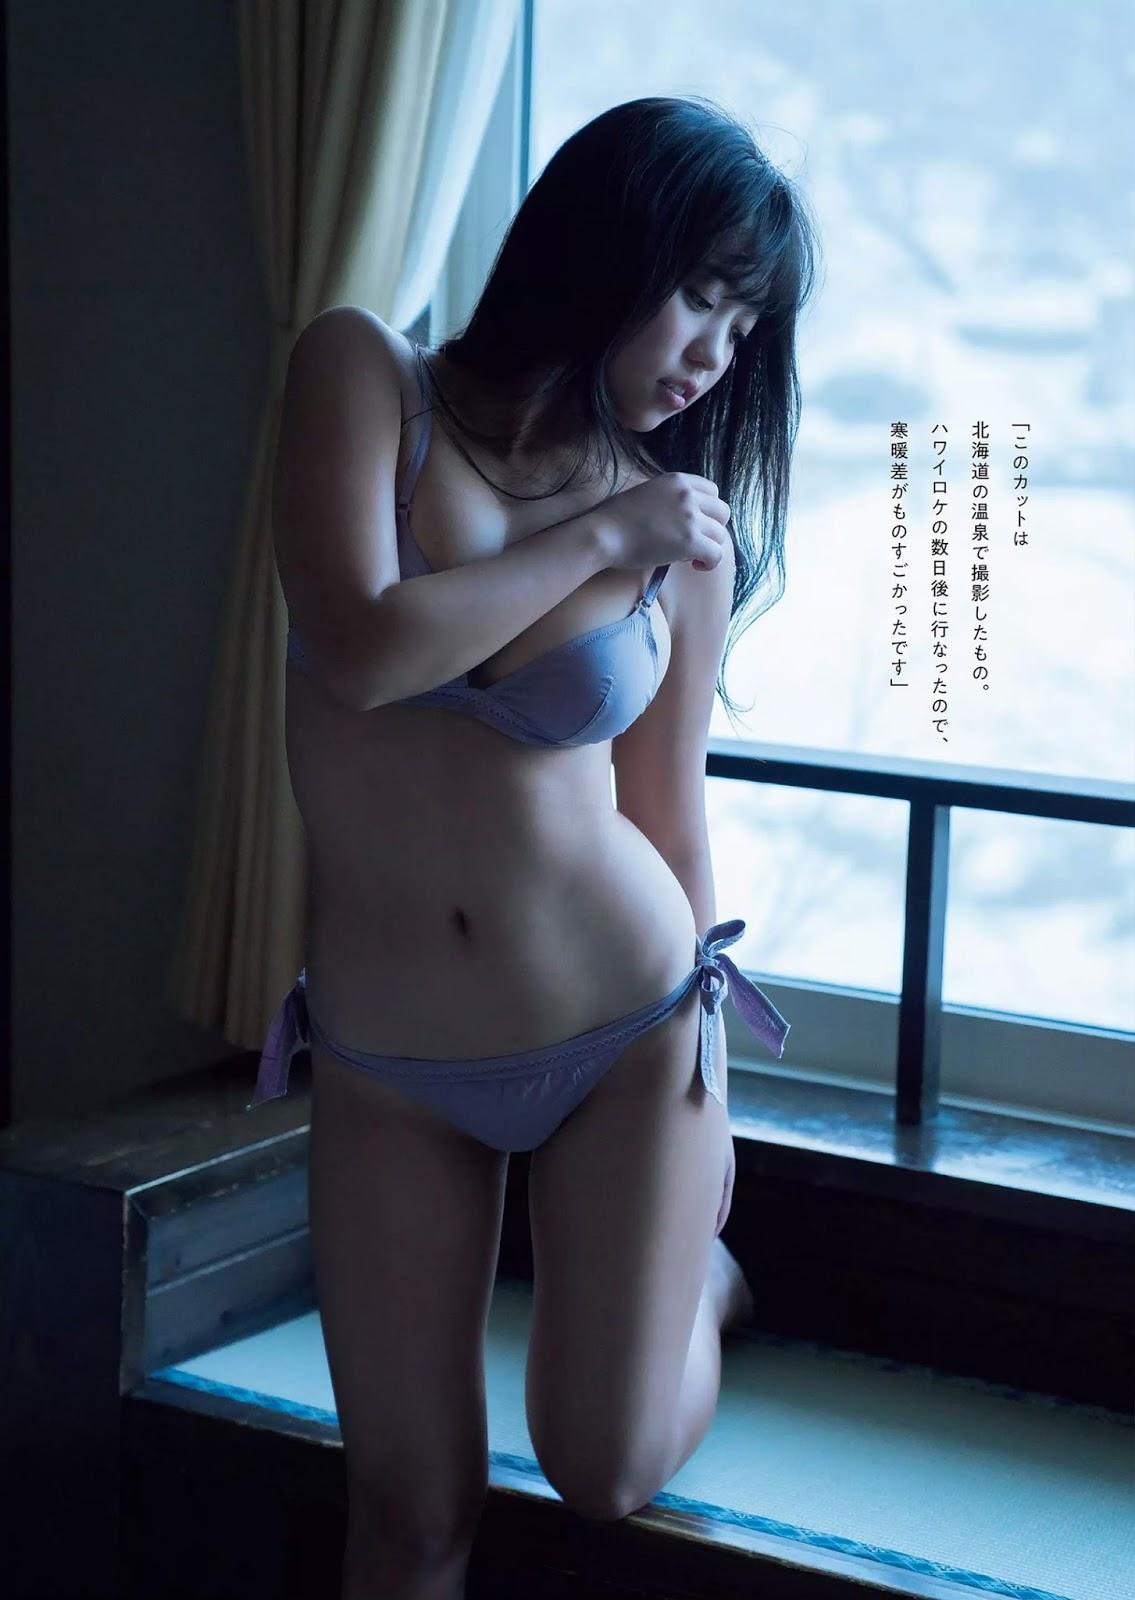 Ohara Yuno 大原優乃, Weekly Playboy 2018 No.11 Part.02 (週刊プレイボーイ 2018年11号)